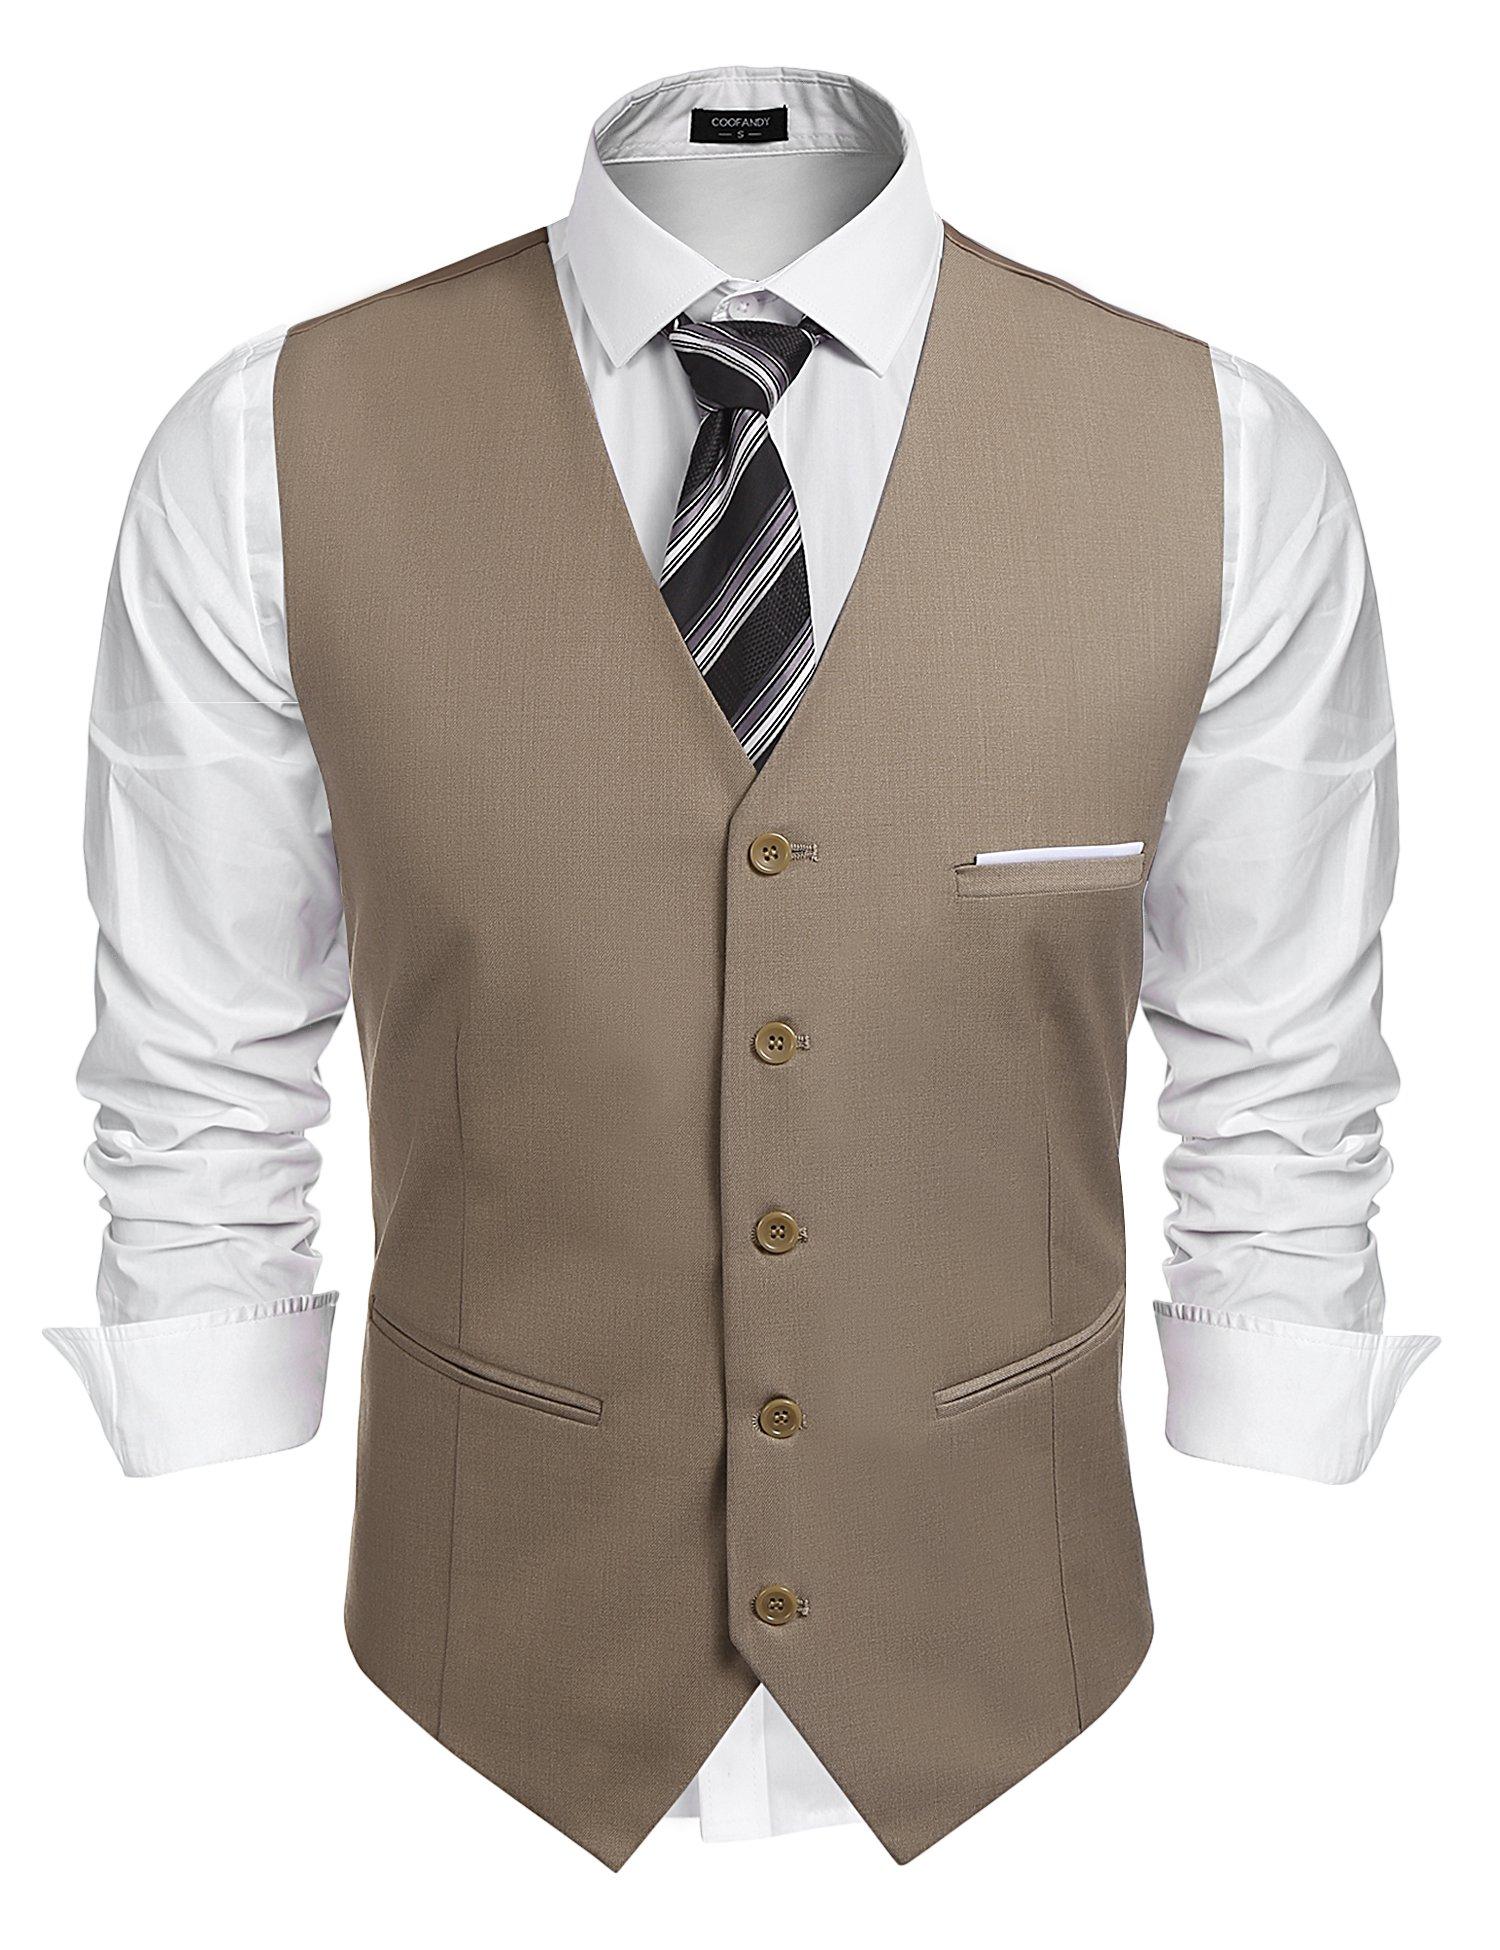 Simbama Men's Slim Fit V-Neck Business Dress Suit Vest Wedding Party Waistcoat